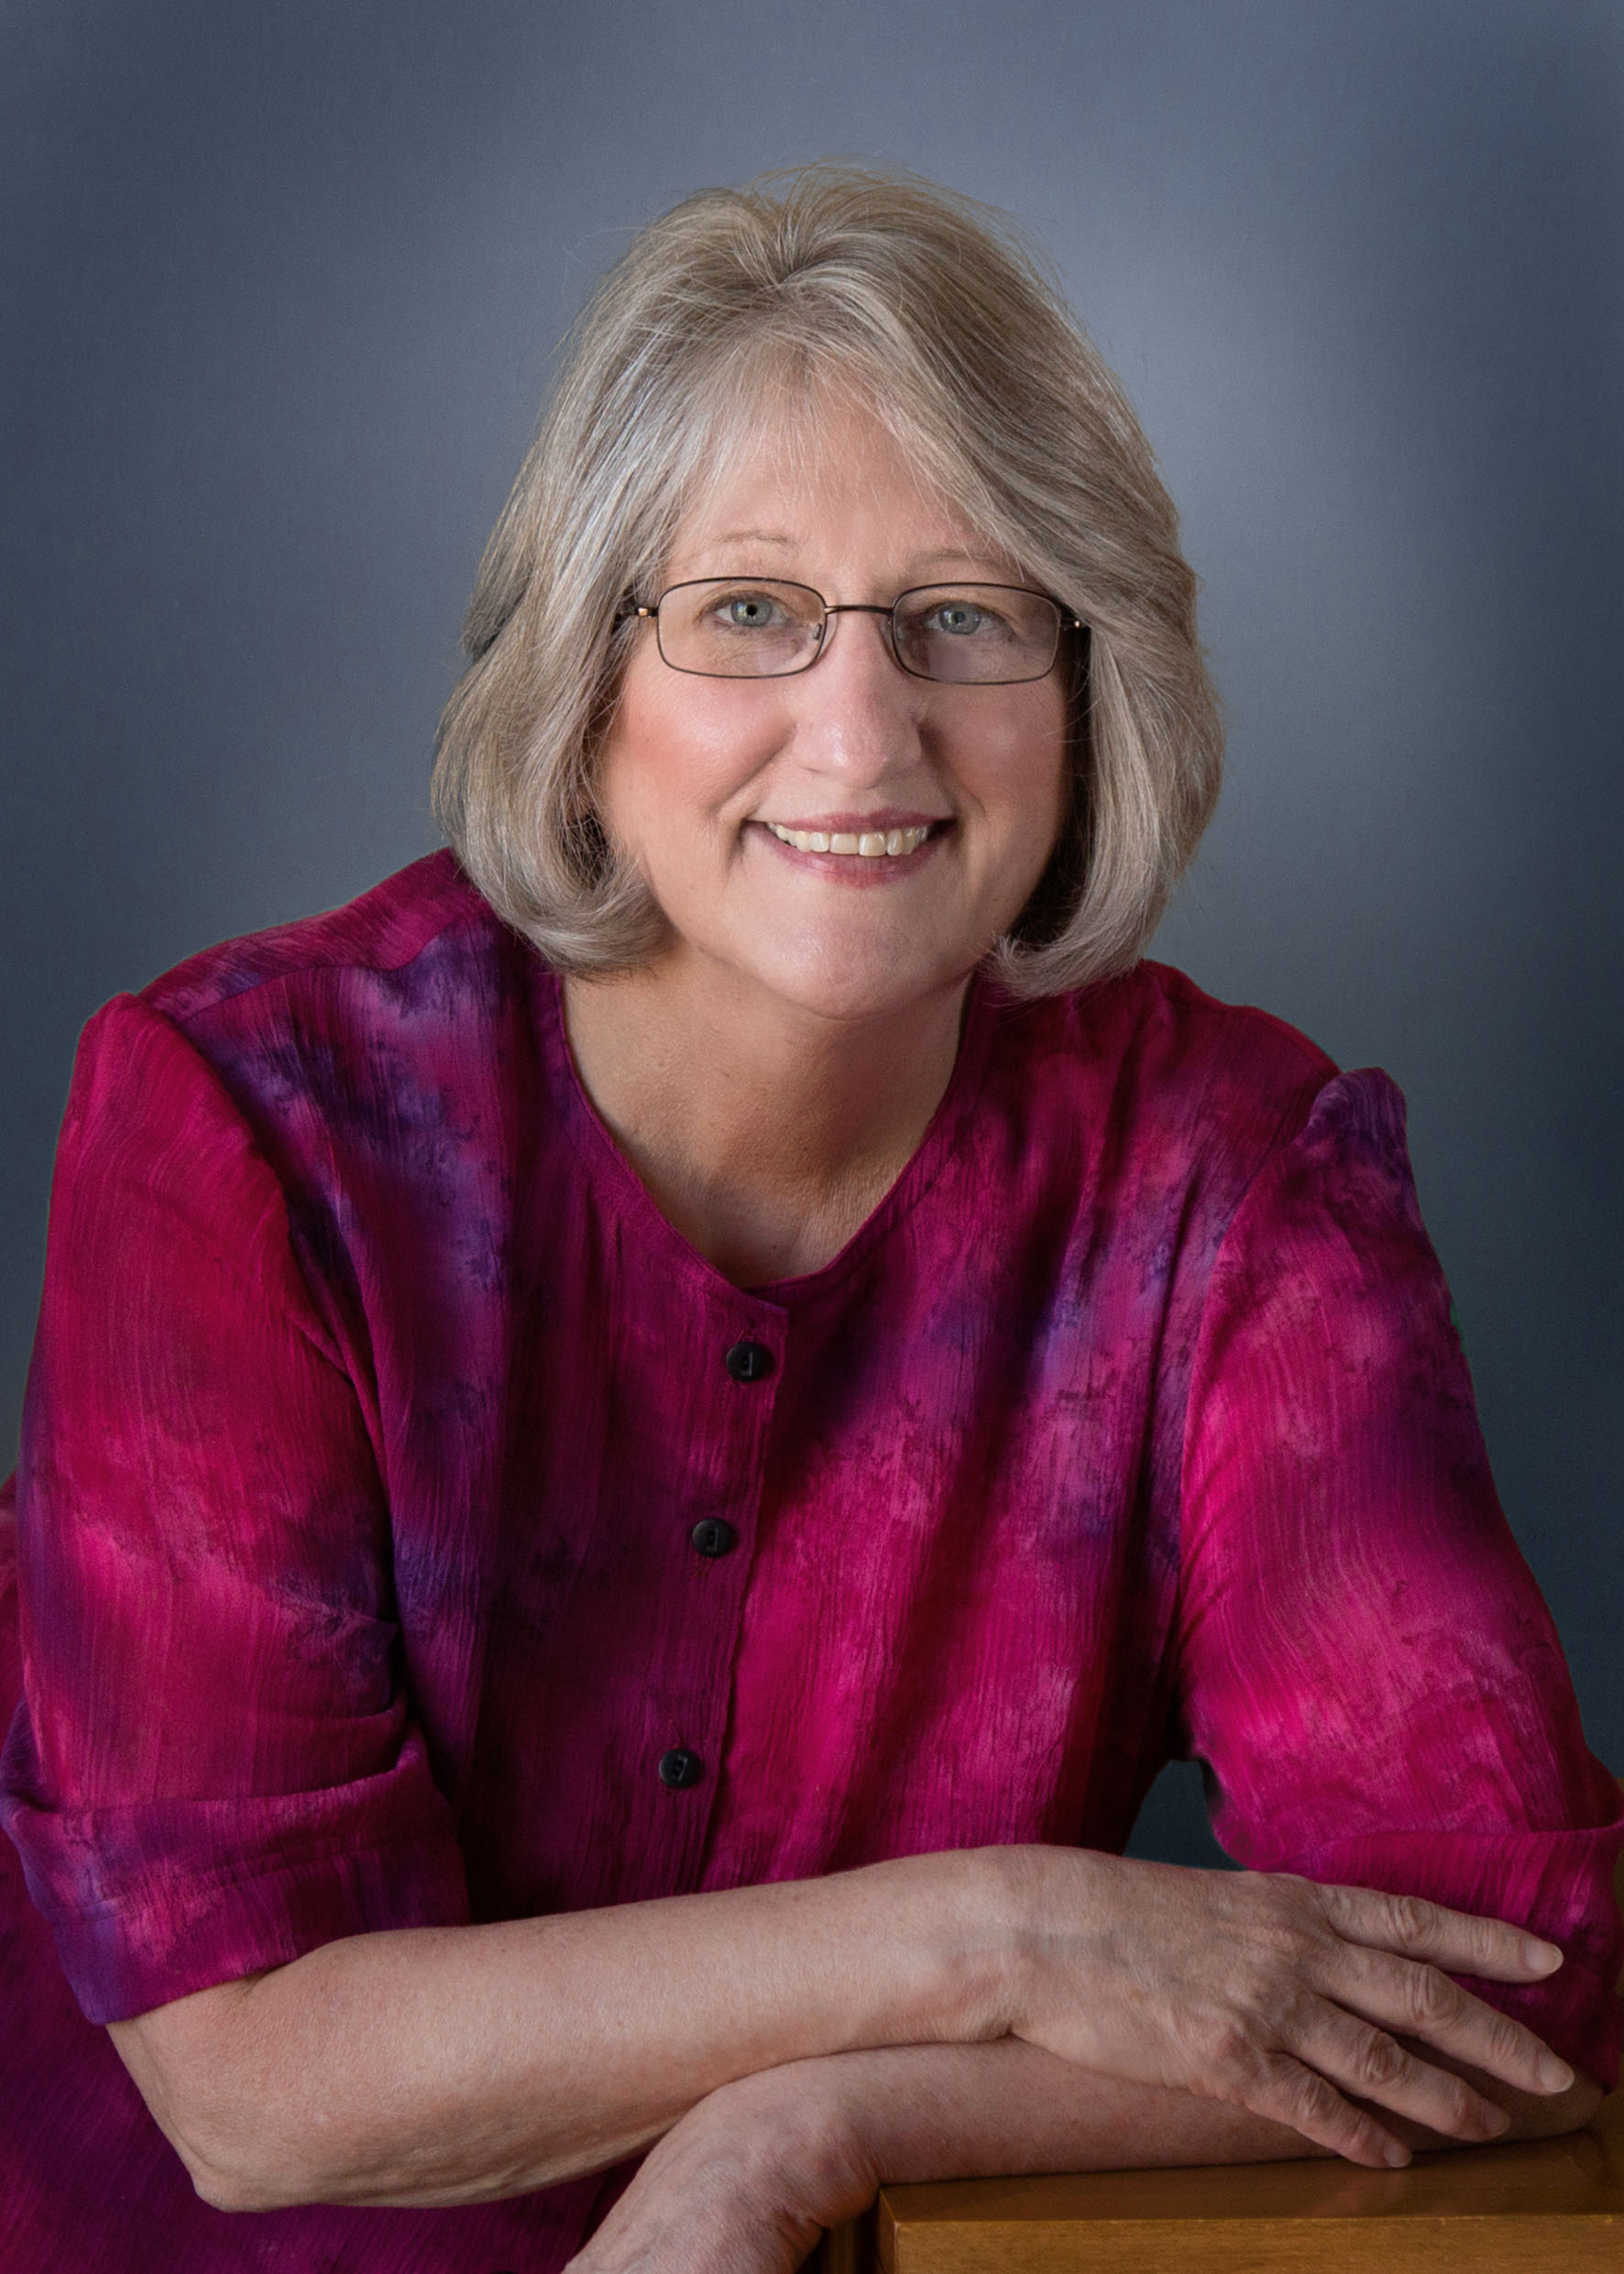 Laurie Tigner